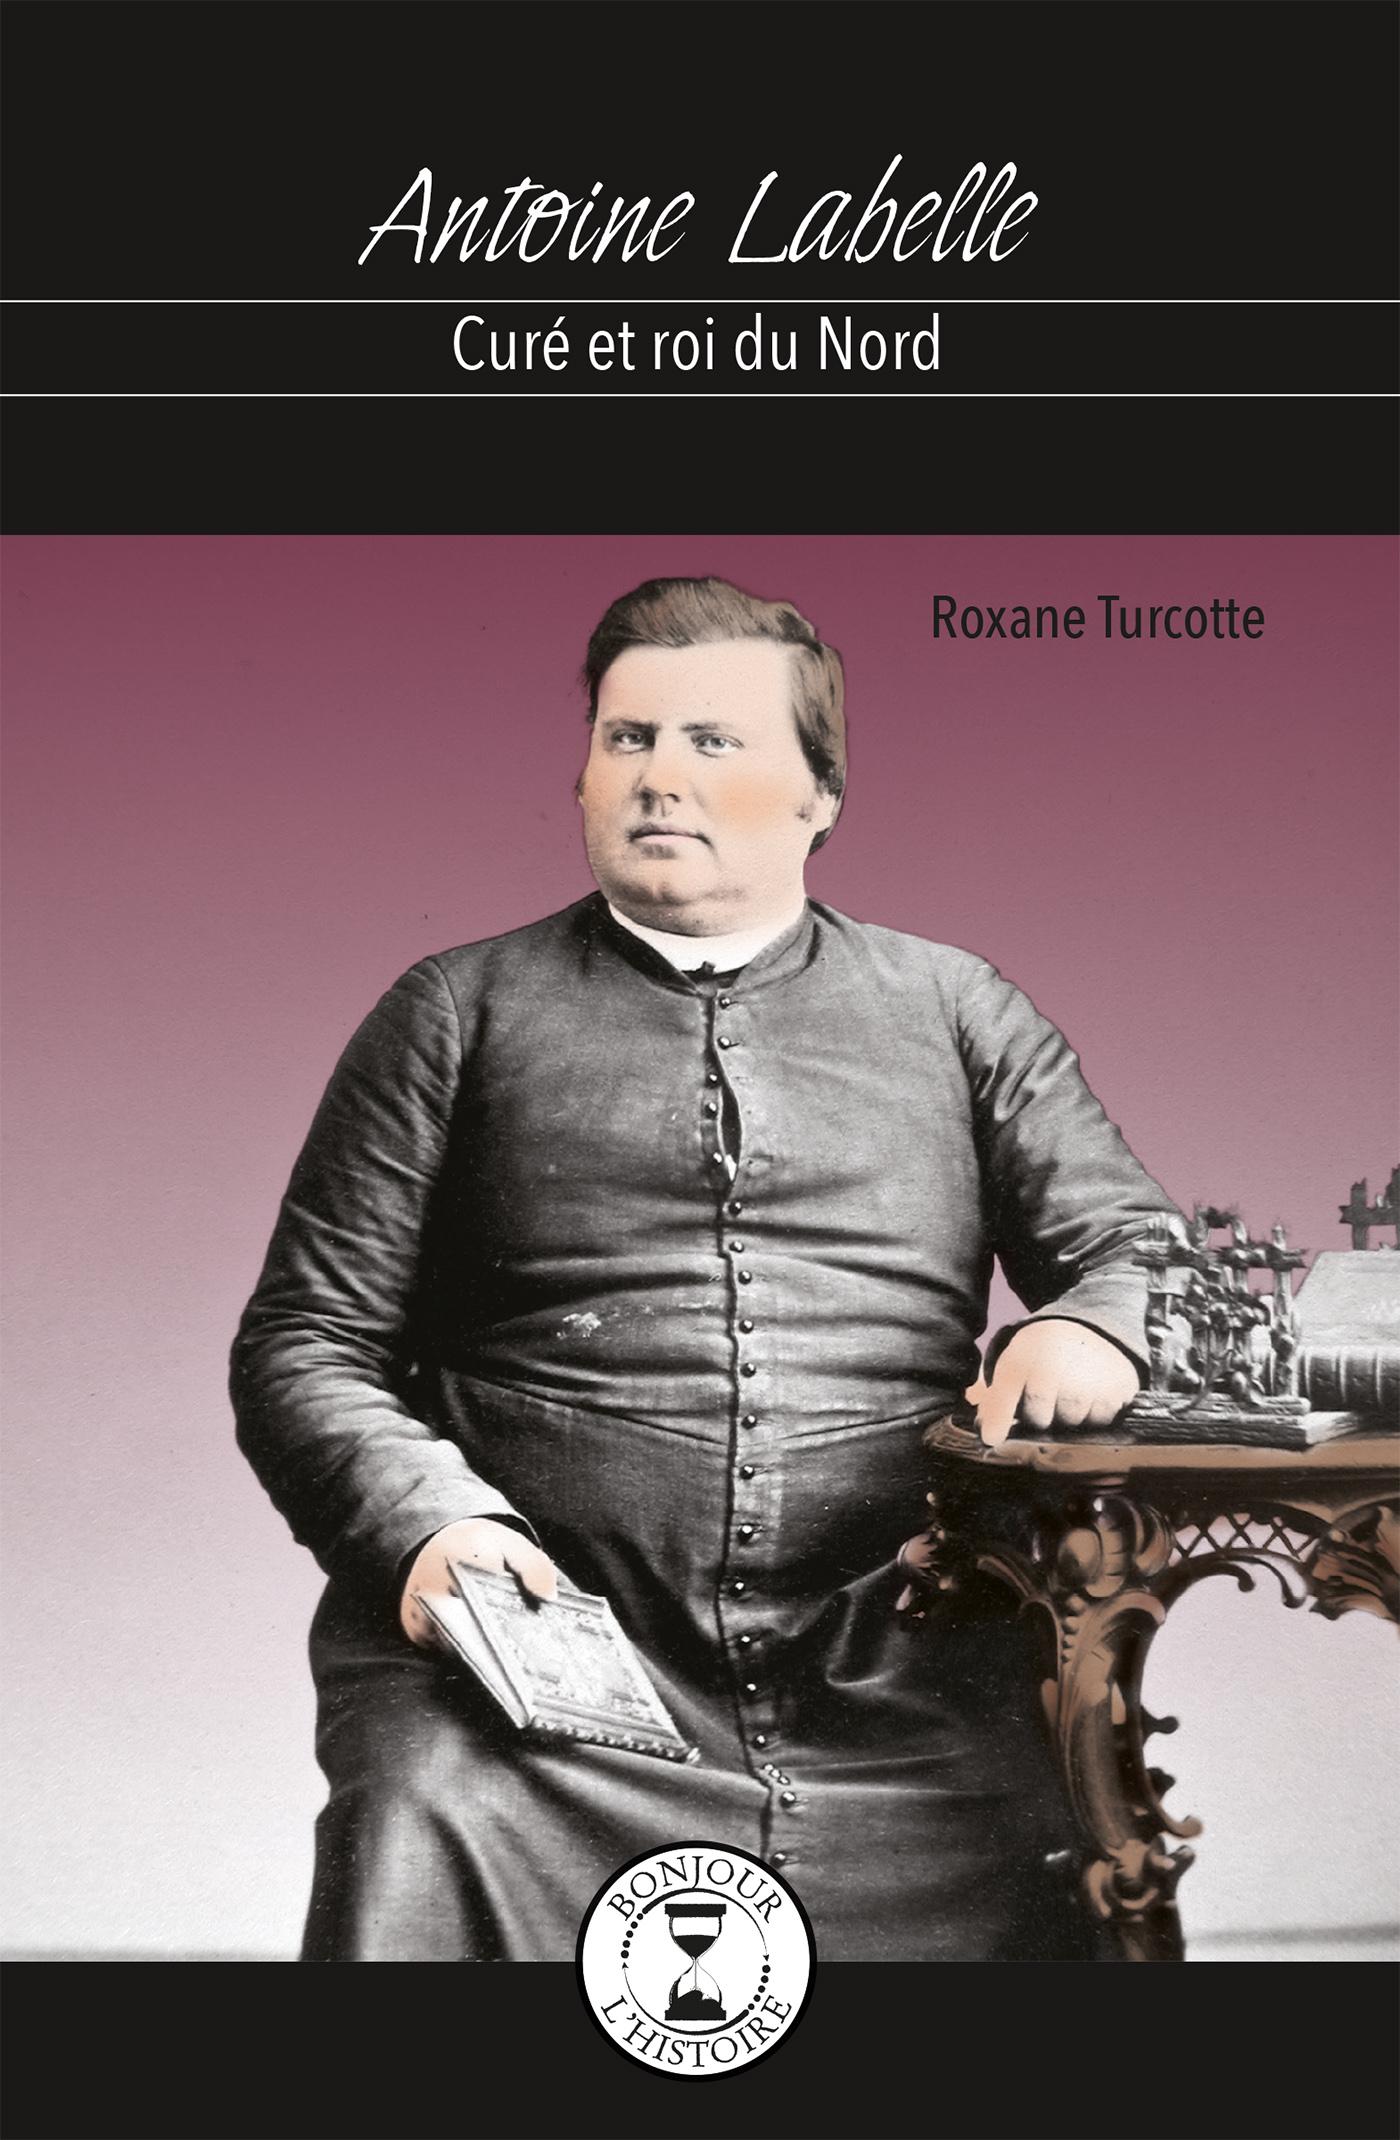 Antoine Labelle